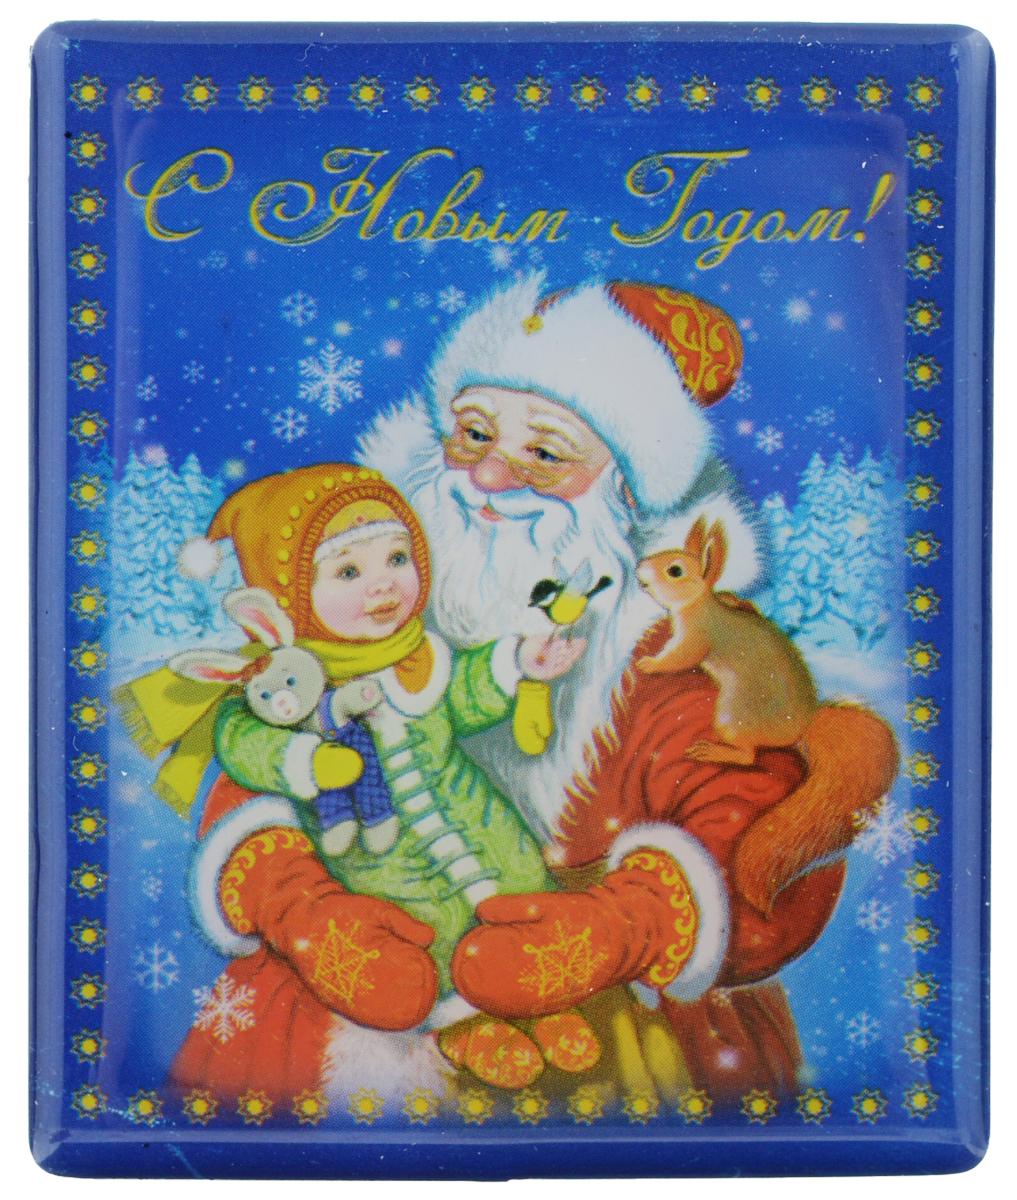 Магнит Феникс-презент Дед Мороз с ребенком, 6 см х 5 см подсвечник декоративный феникс презент цвет голубой 8 5 х 8 5 х 7 5 см